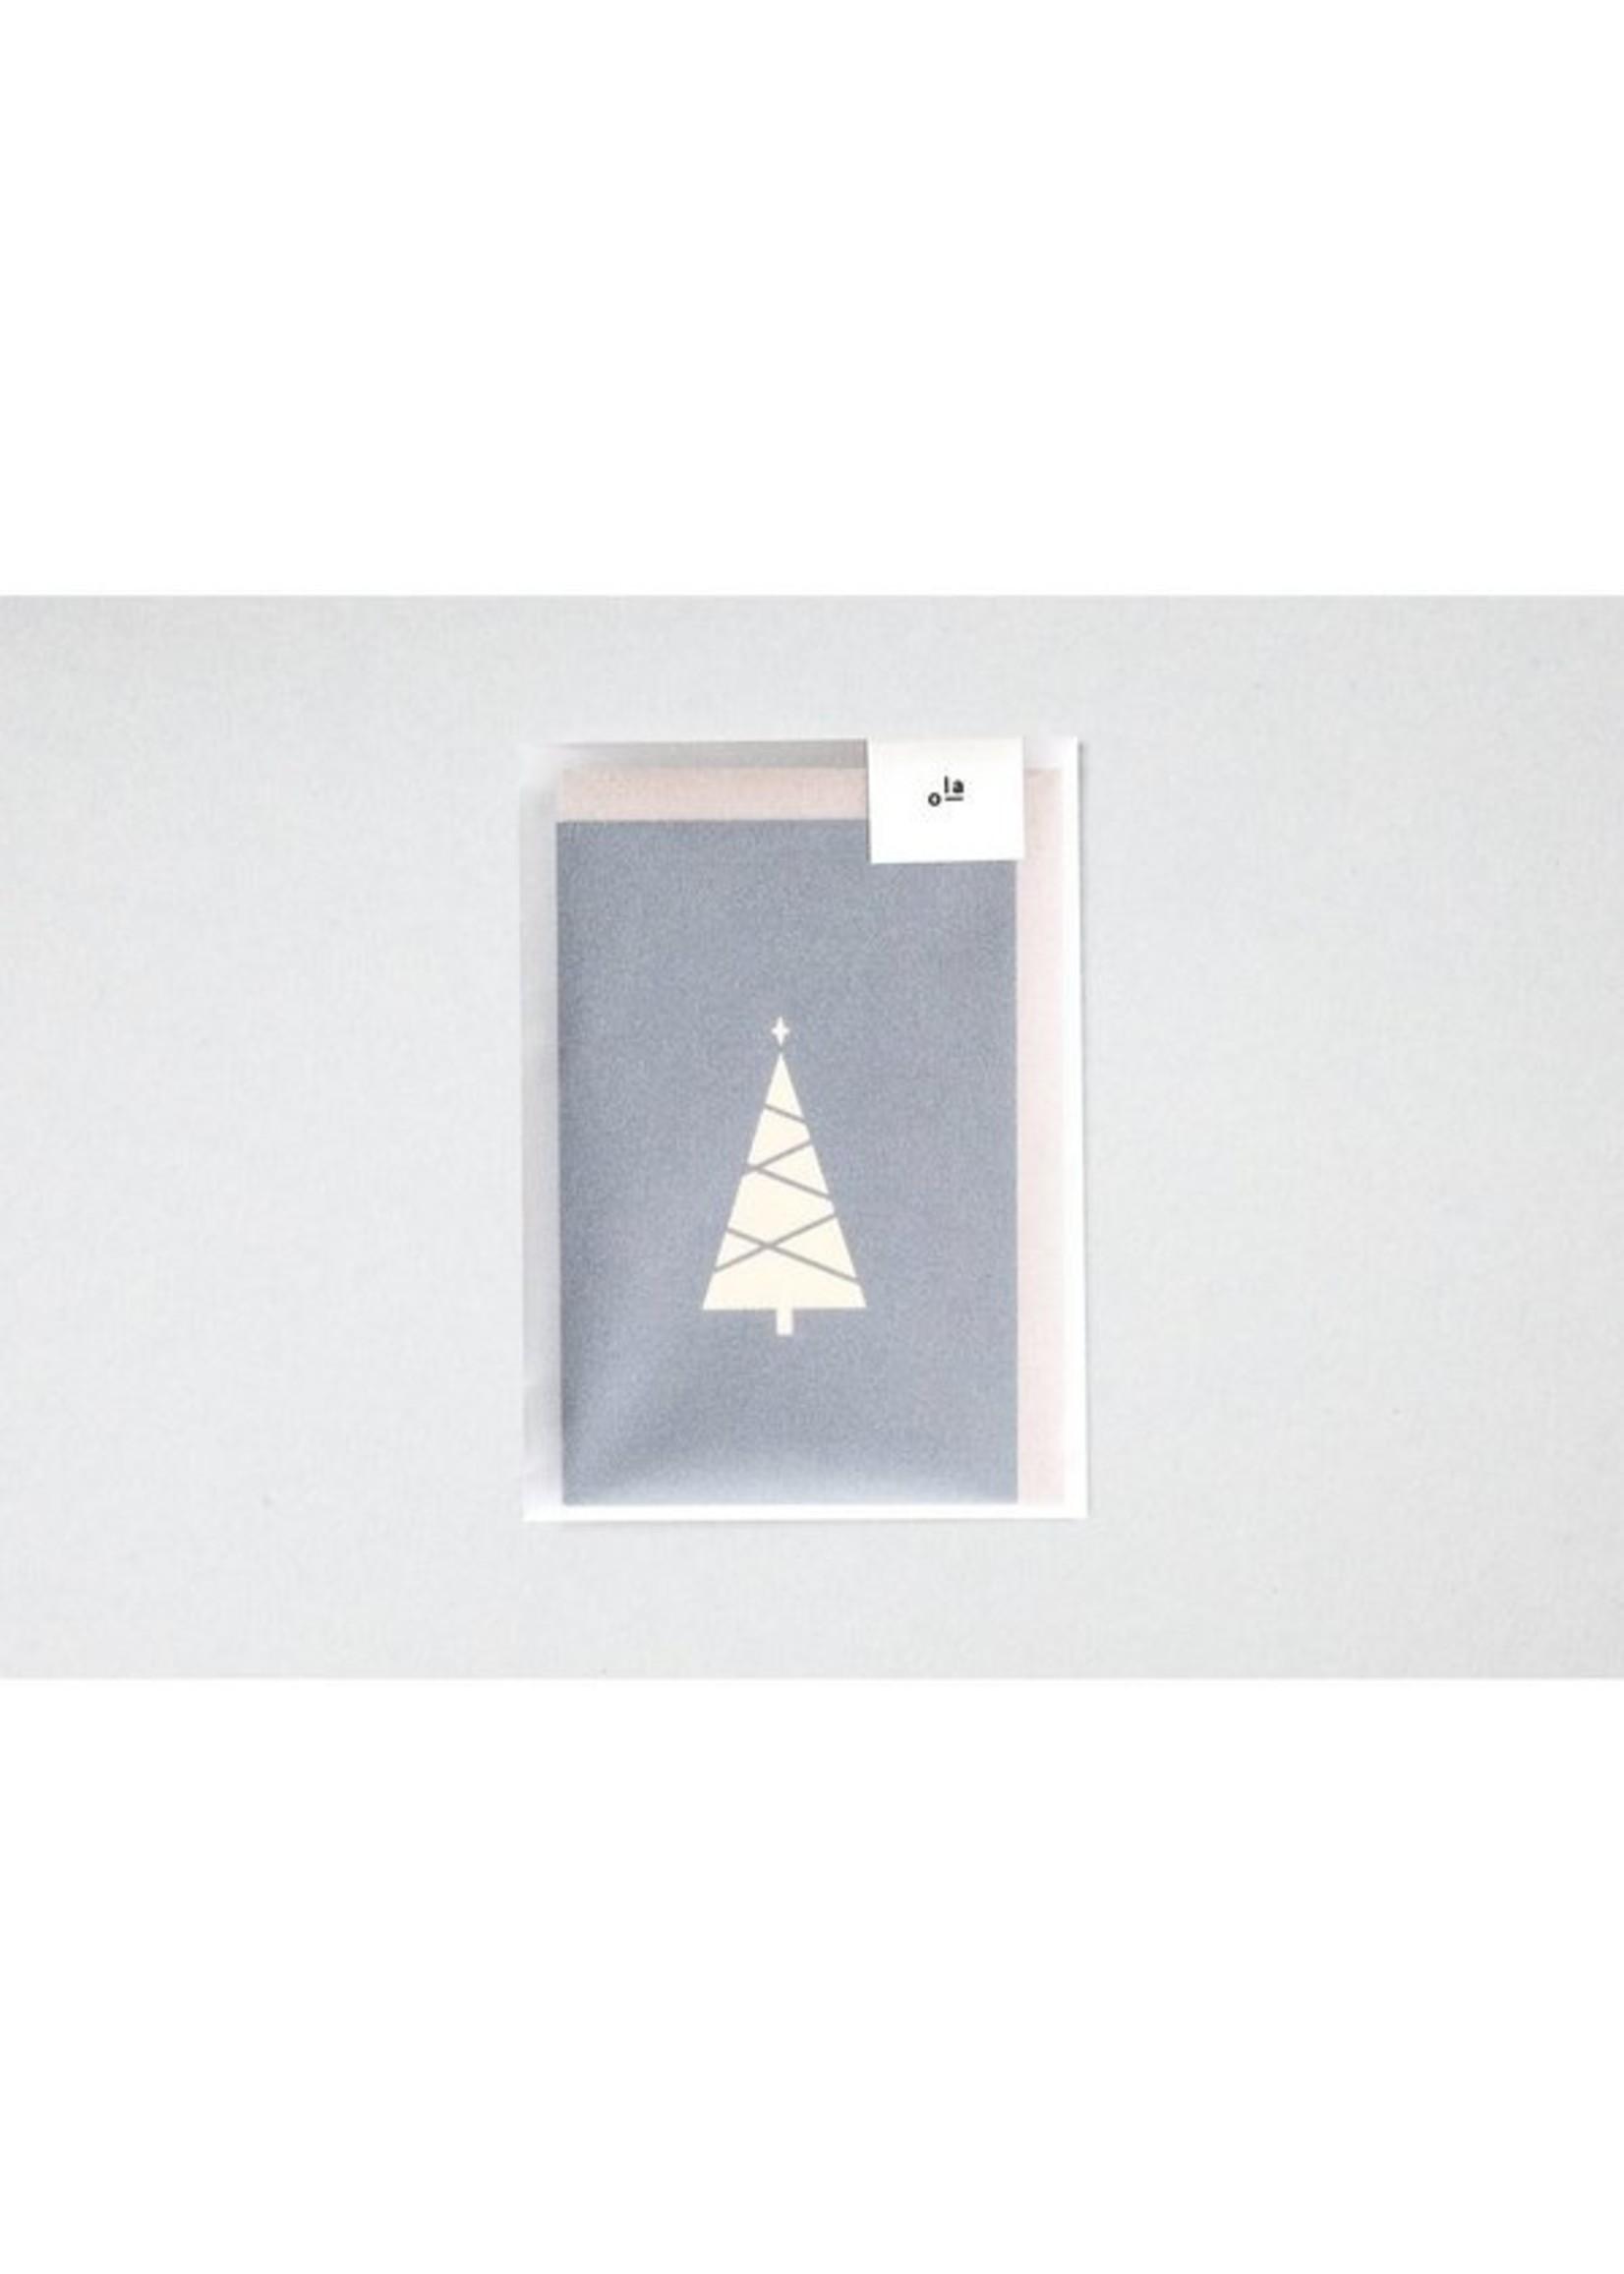 Ola Ola Foil Blocked Cards: Tree Print Pack of 6